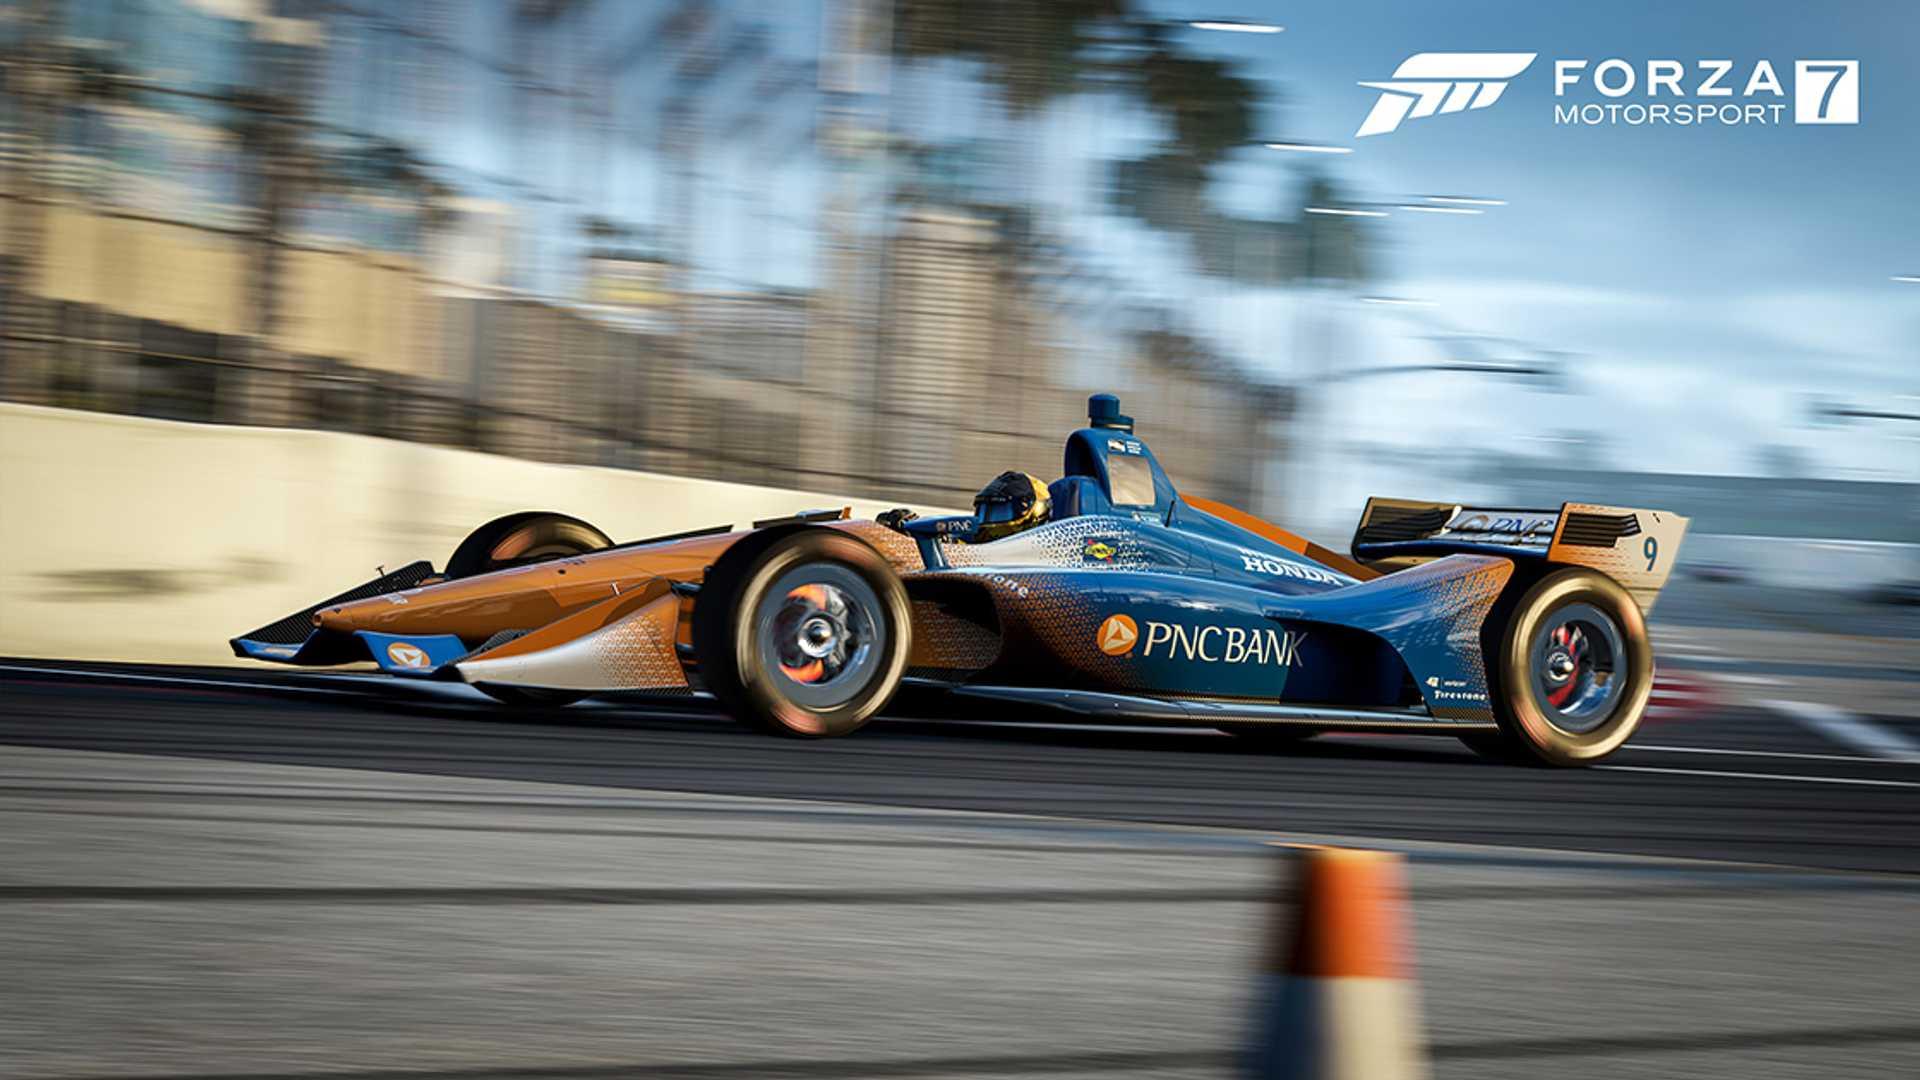 forza-motorsport-7-may-2019-update-1